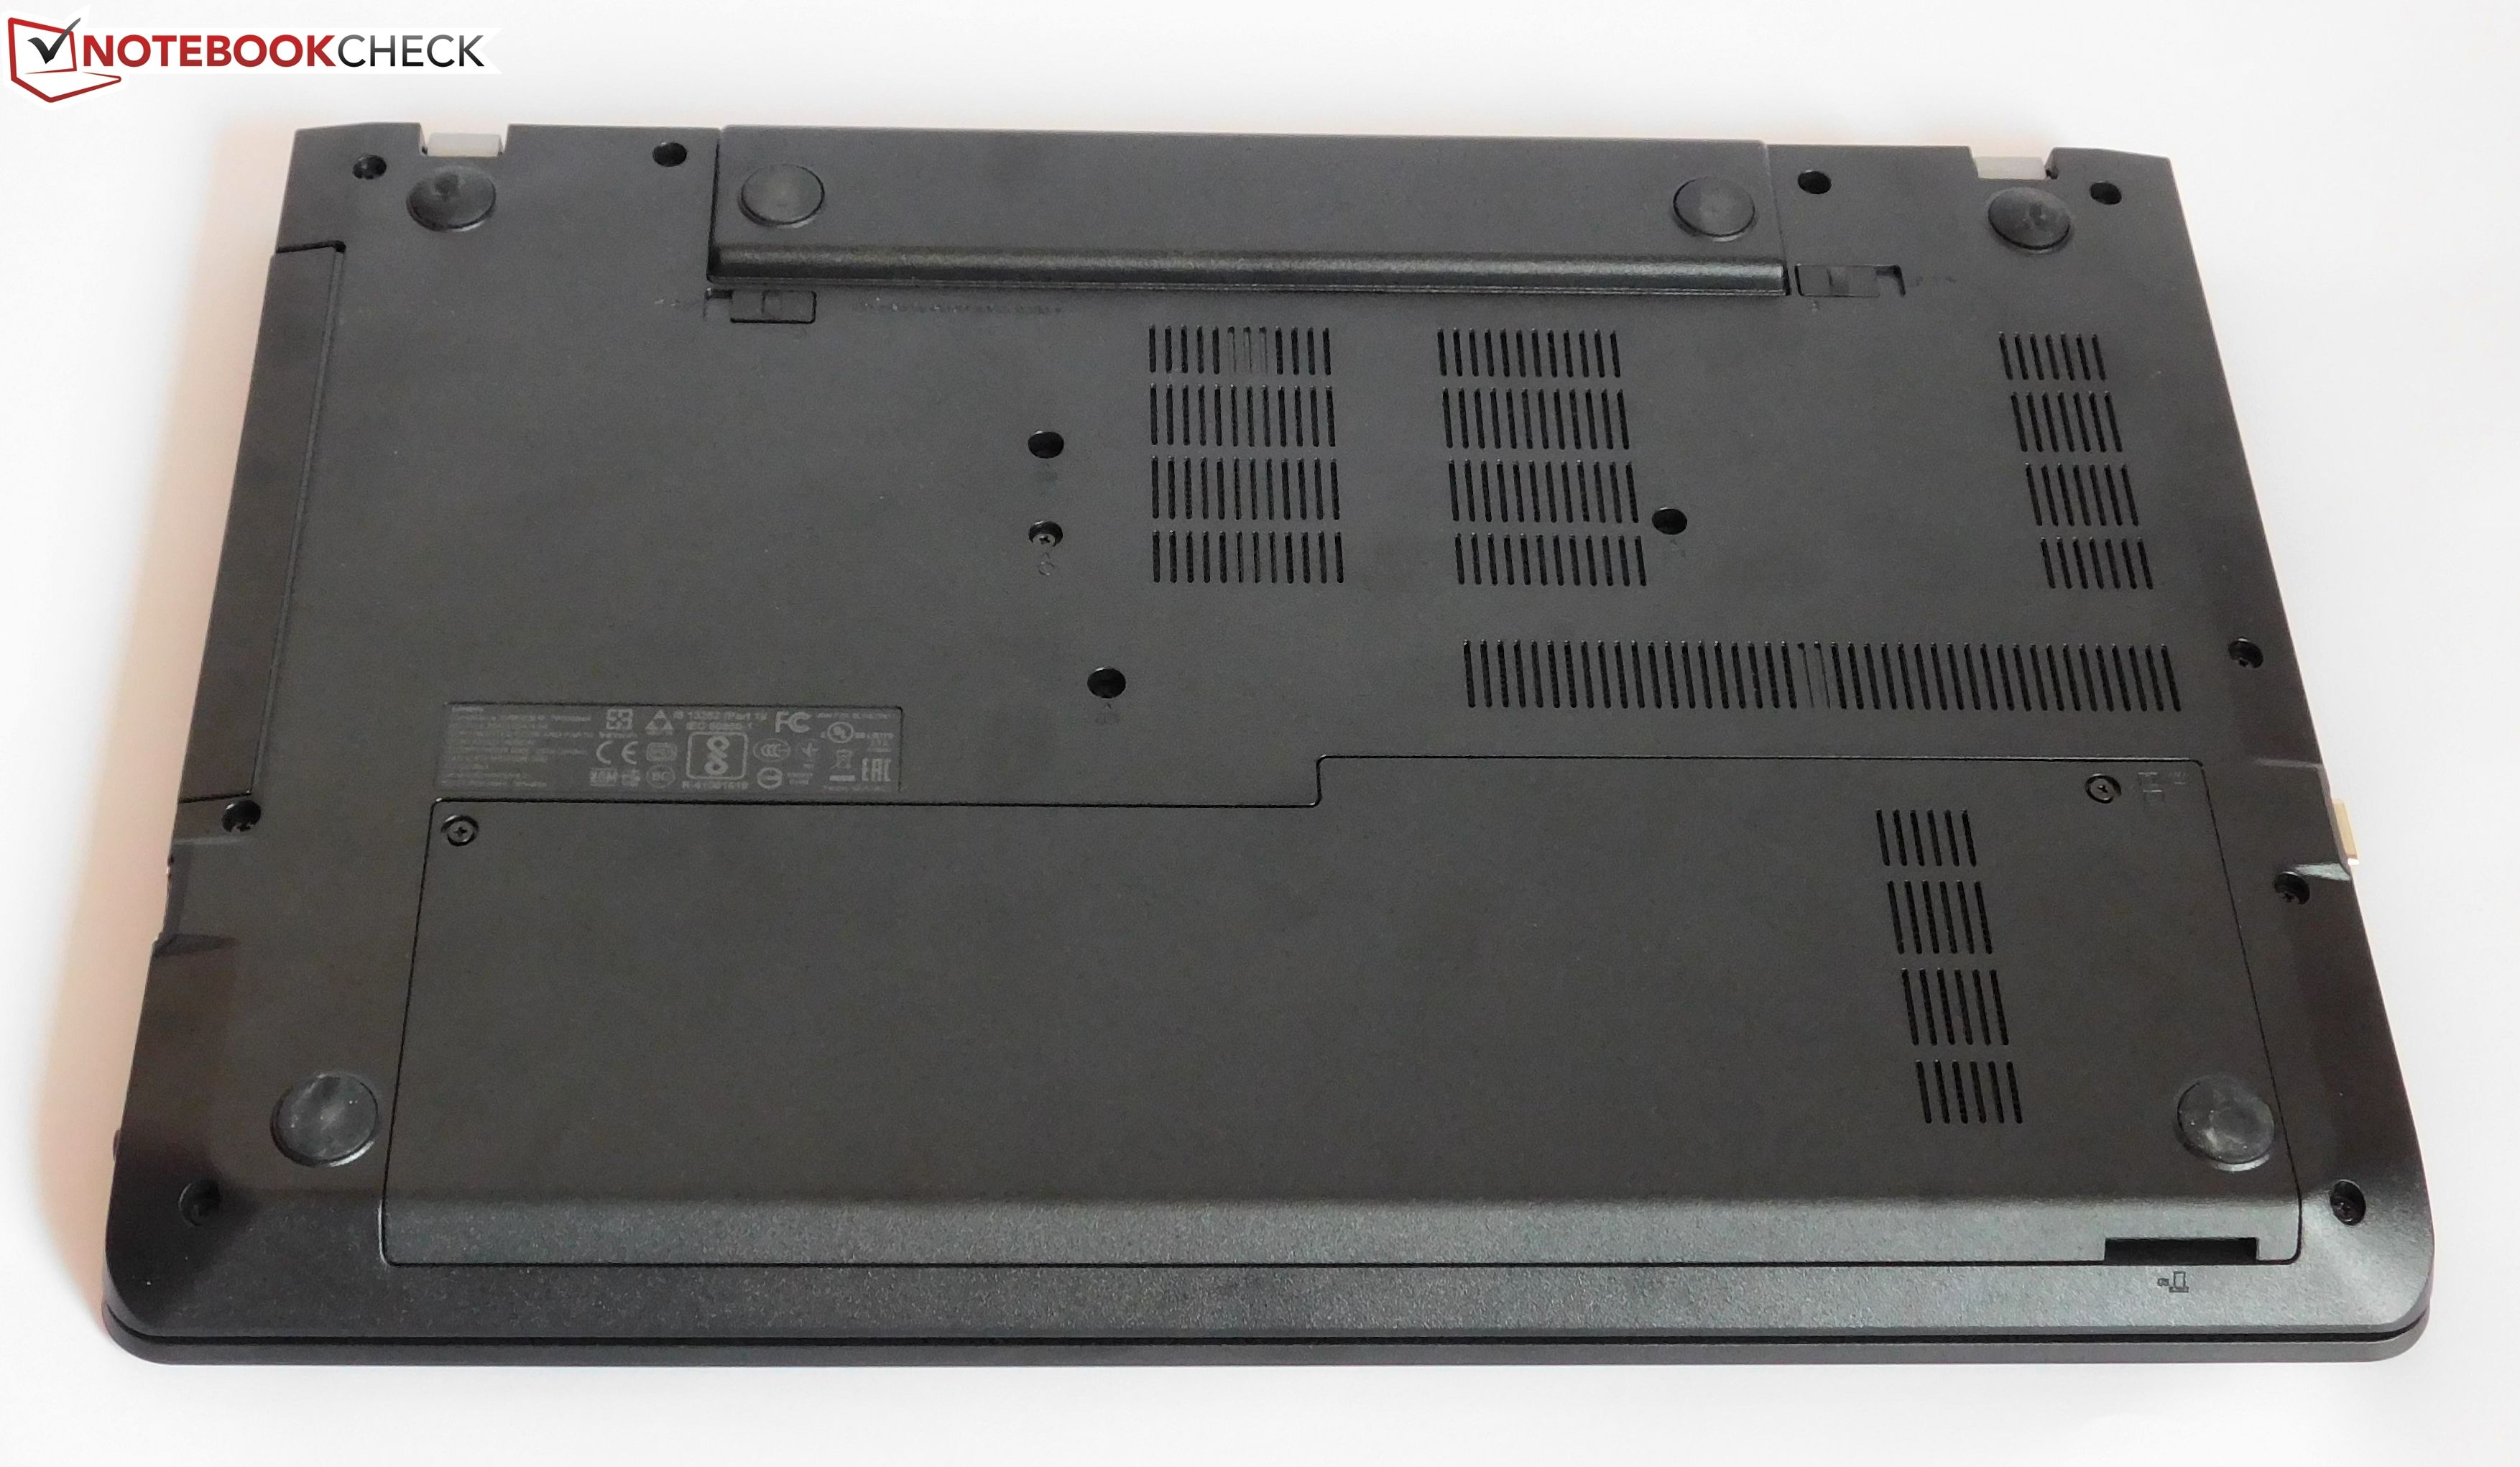 Lenovo ThinkPad E570 (Core i5, GTX 950M) Notebook Review